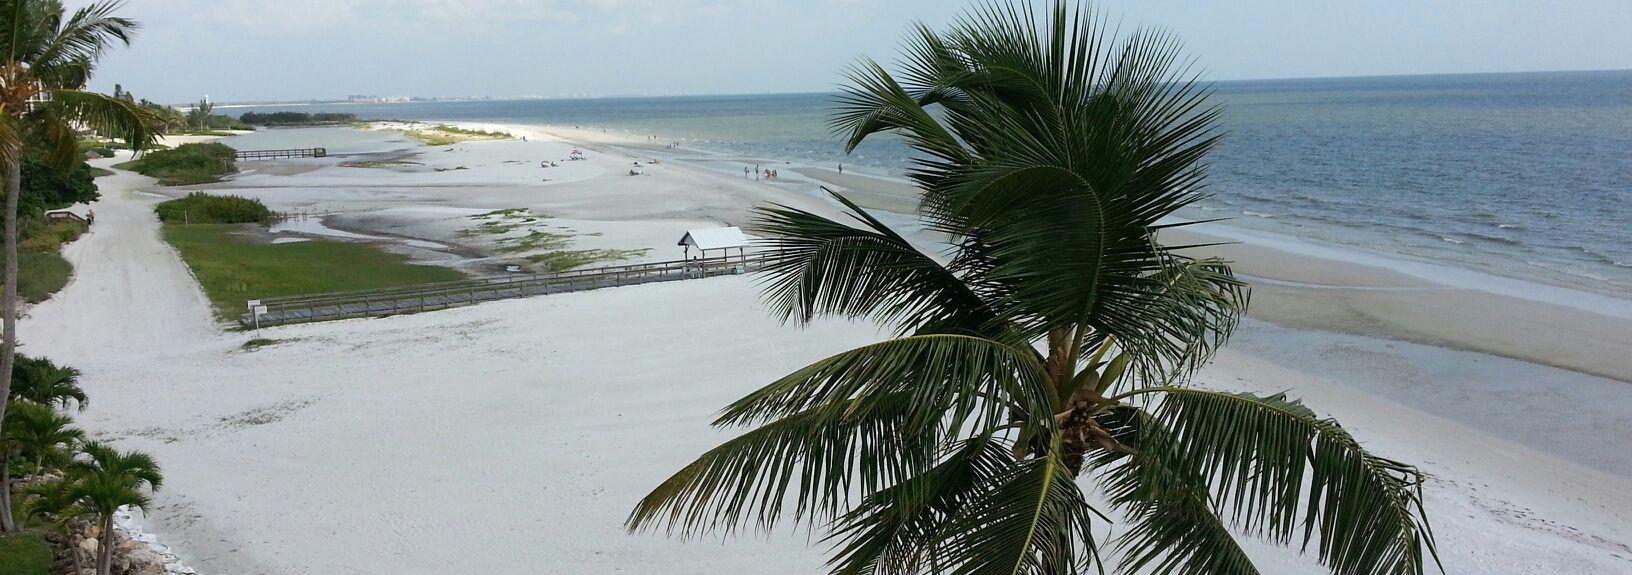 Leonardo Arms, Fort Myers Beach, FL, USA